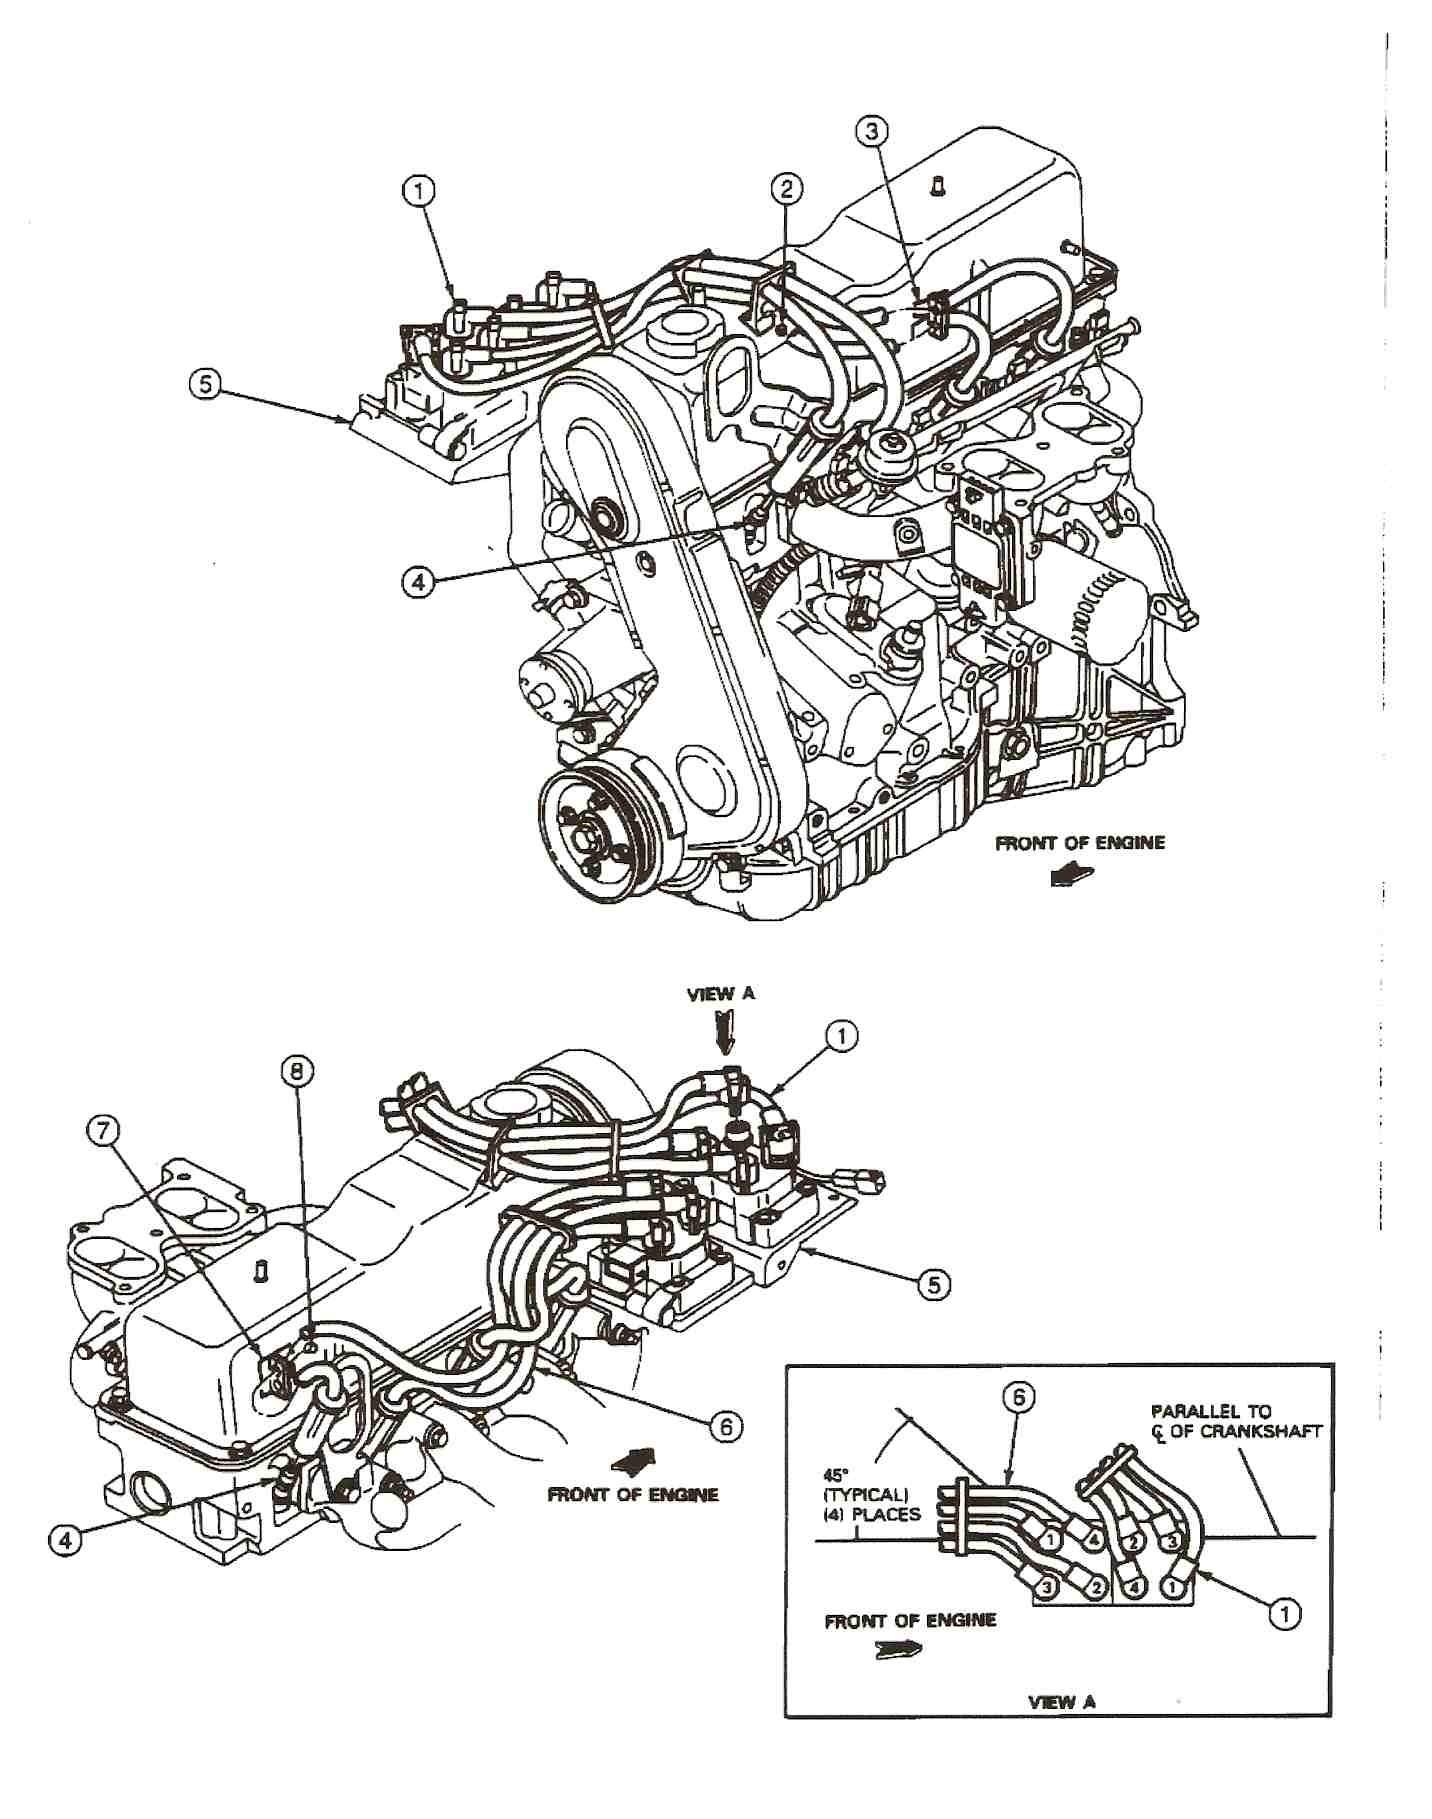 hight resolution of 1999 mazda b2500 engine diagram